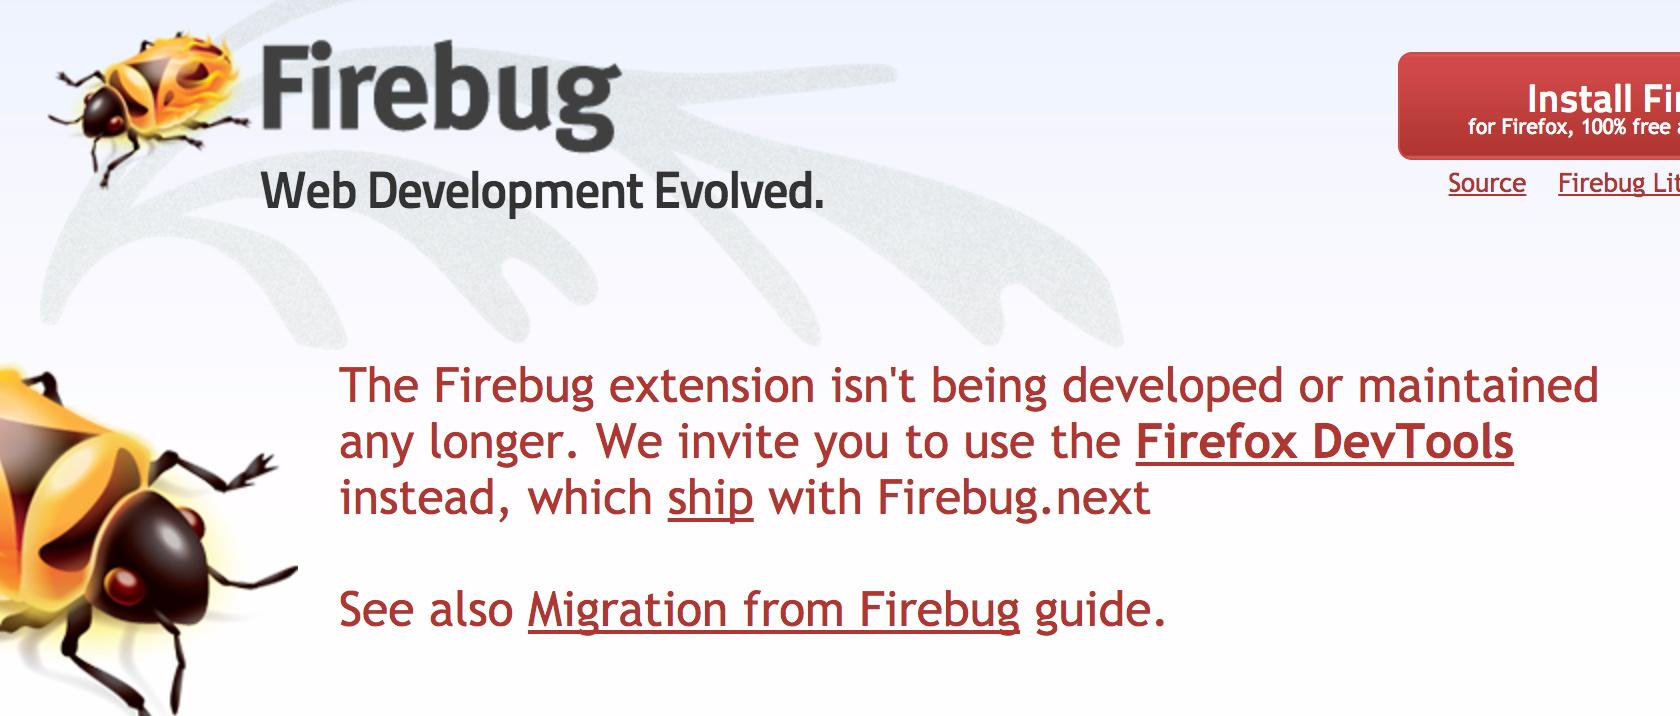 Прекращение поддержки плагина Firebug (а как следствие и Firepath) в